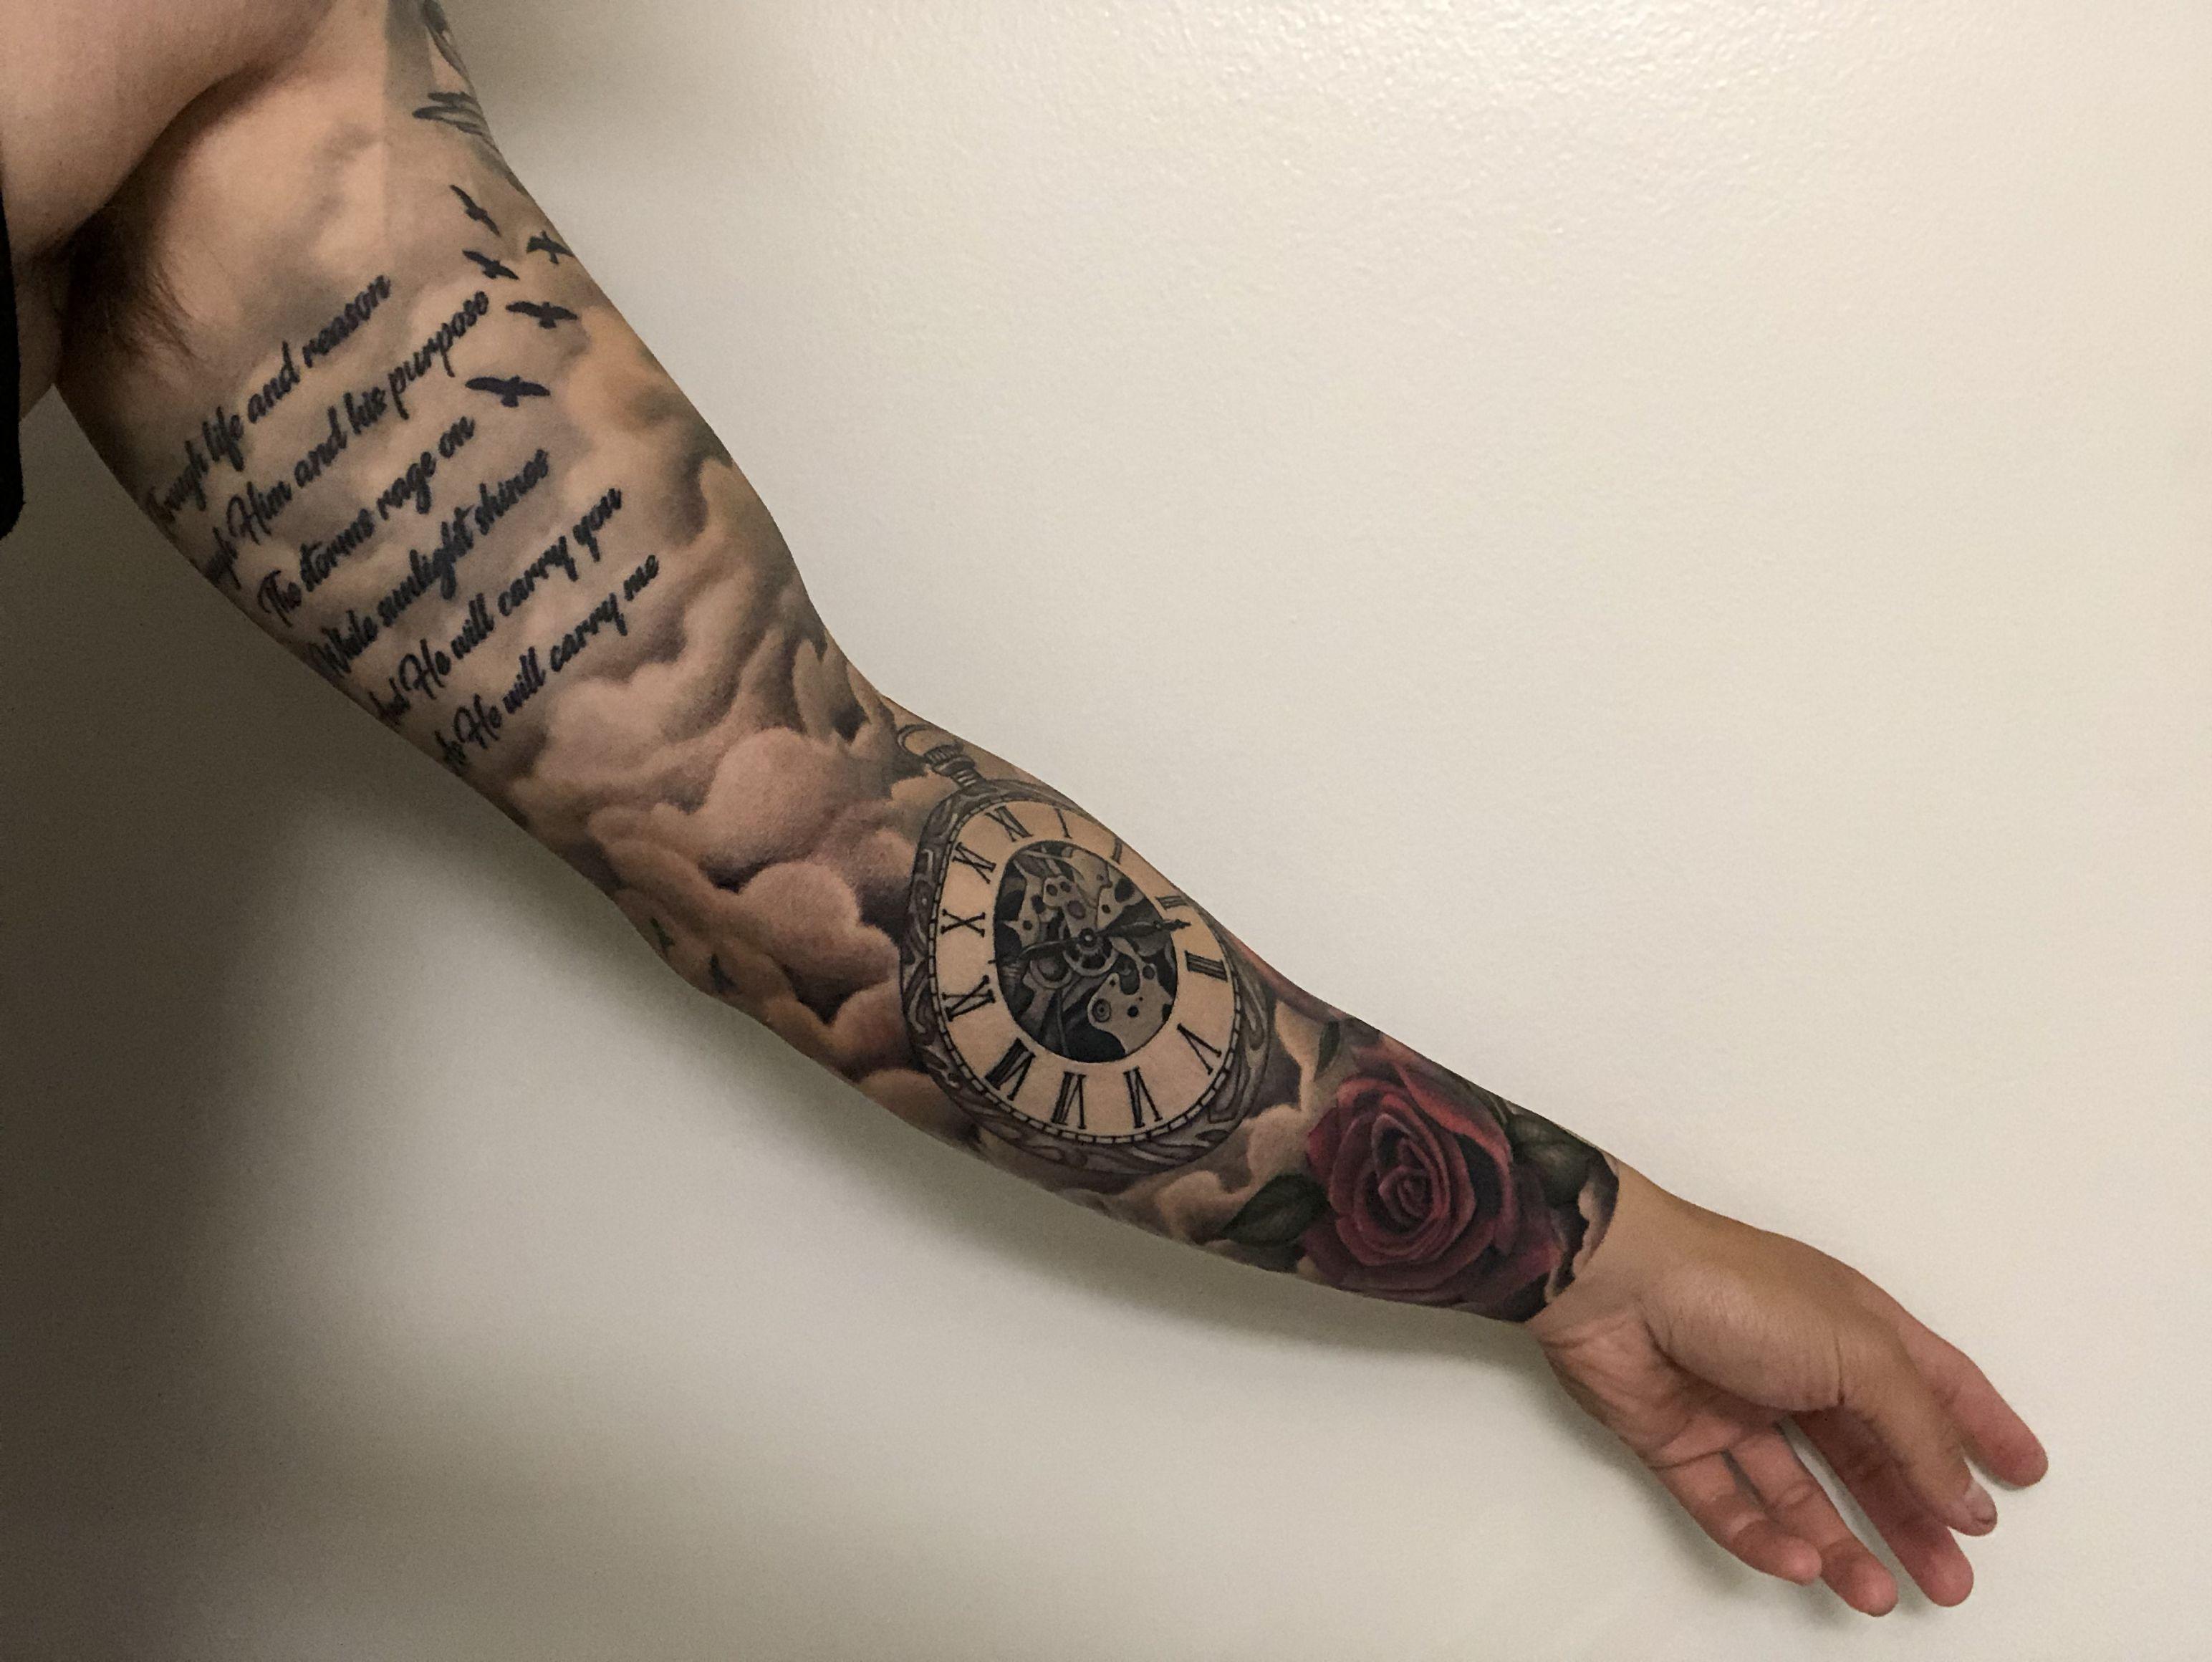 Sleeve Cool forearm tattoos, Bird tattoos arm, Tattoos